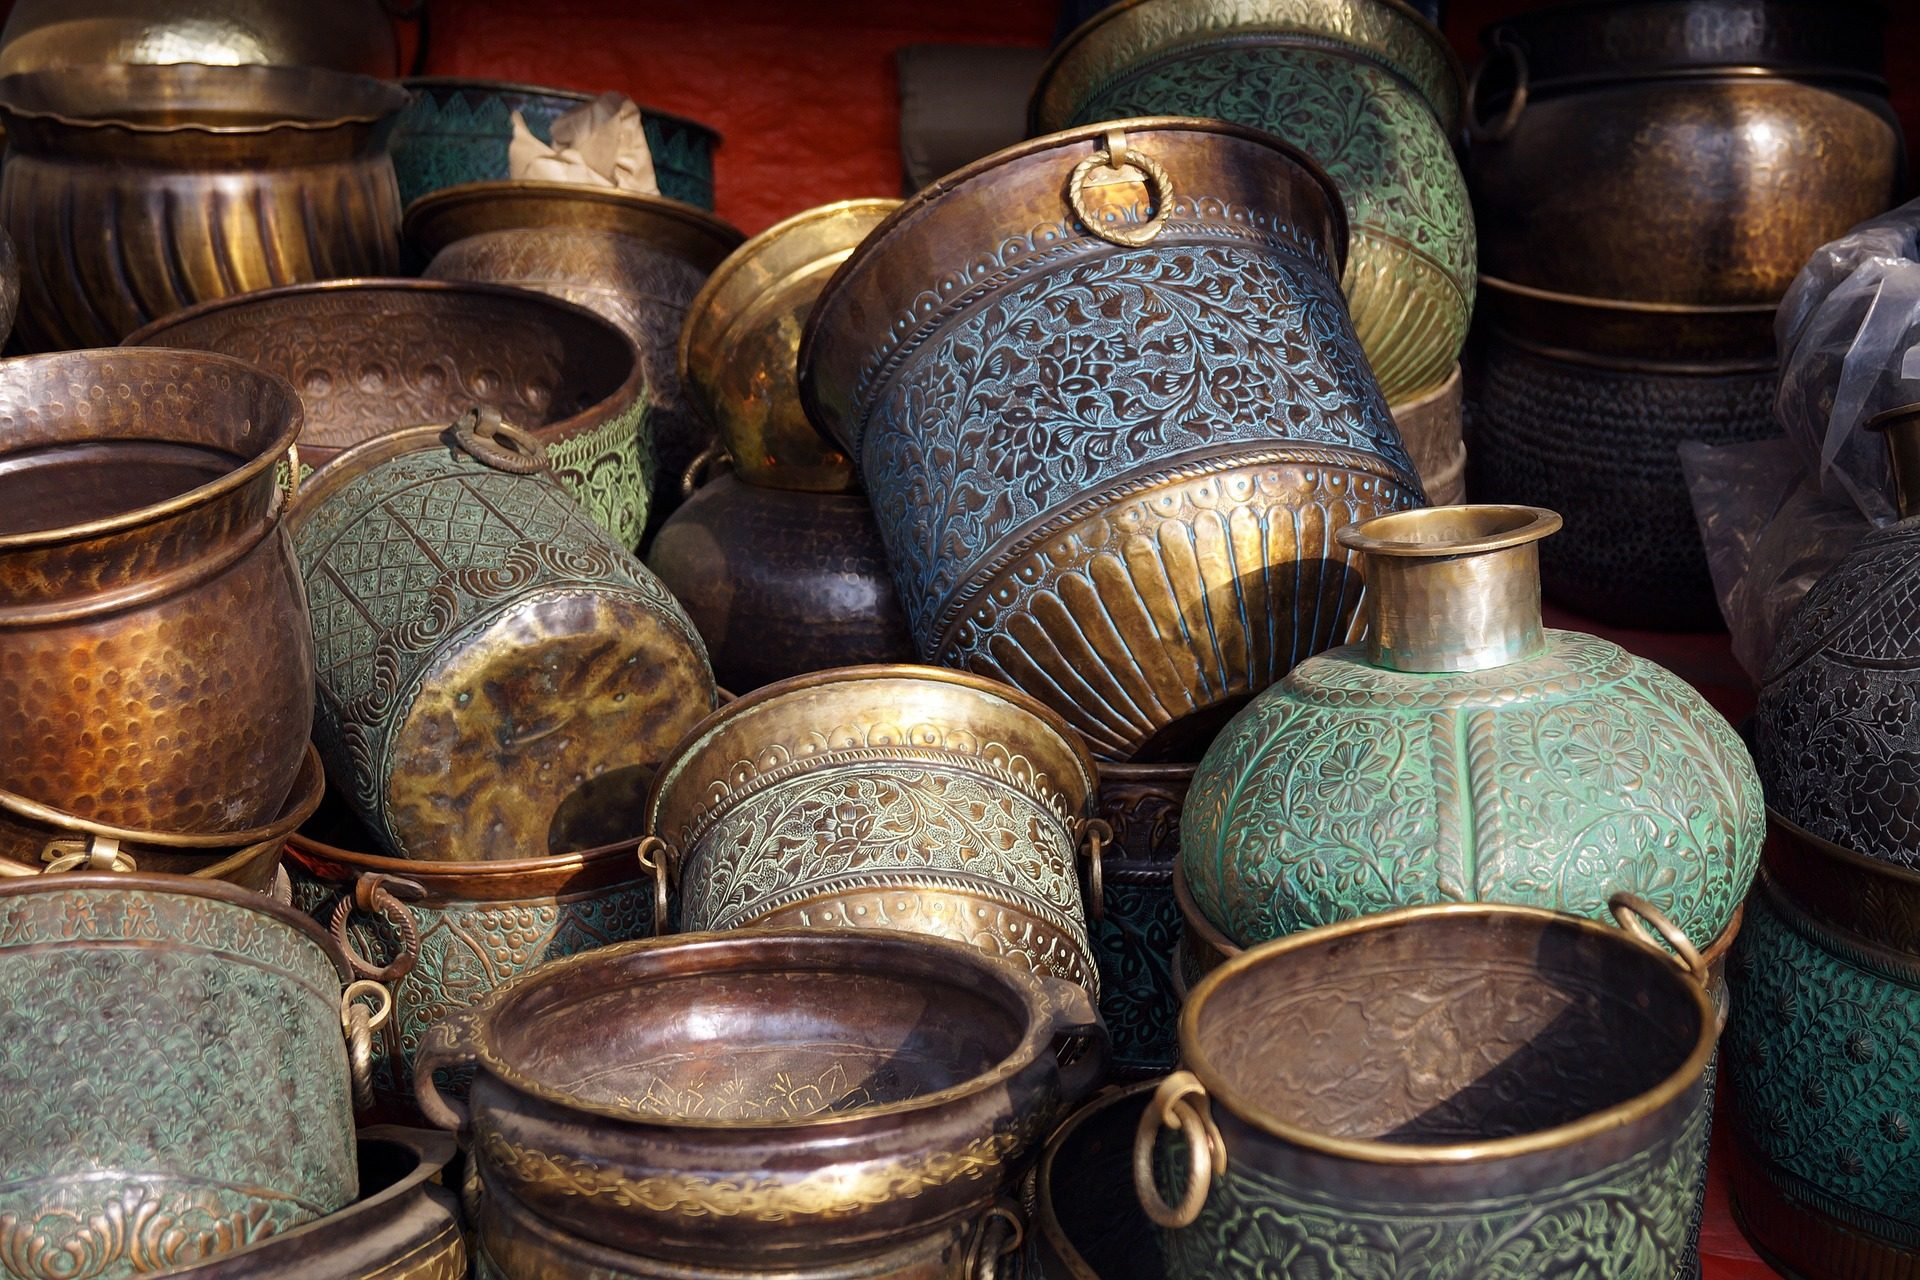 ciotole, vasijas, navi, rame, oggetto d'antiquariato - Sfondi HD - Professor-falken.com